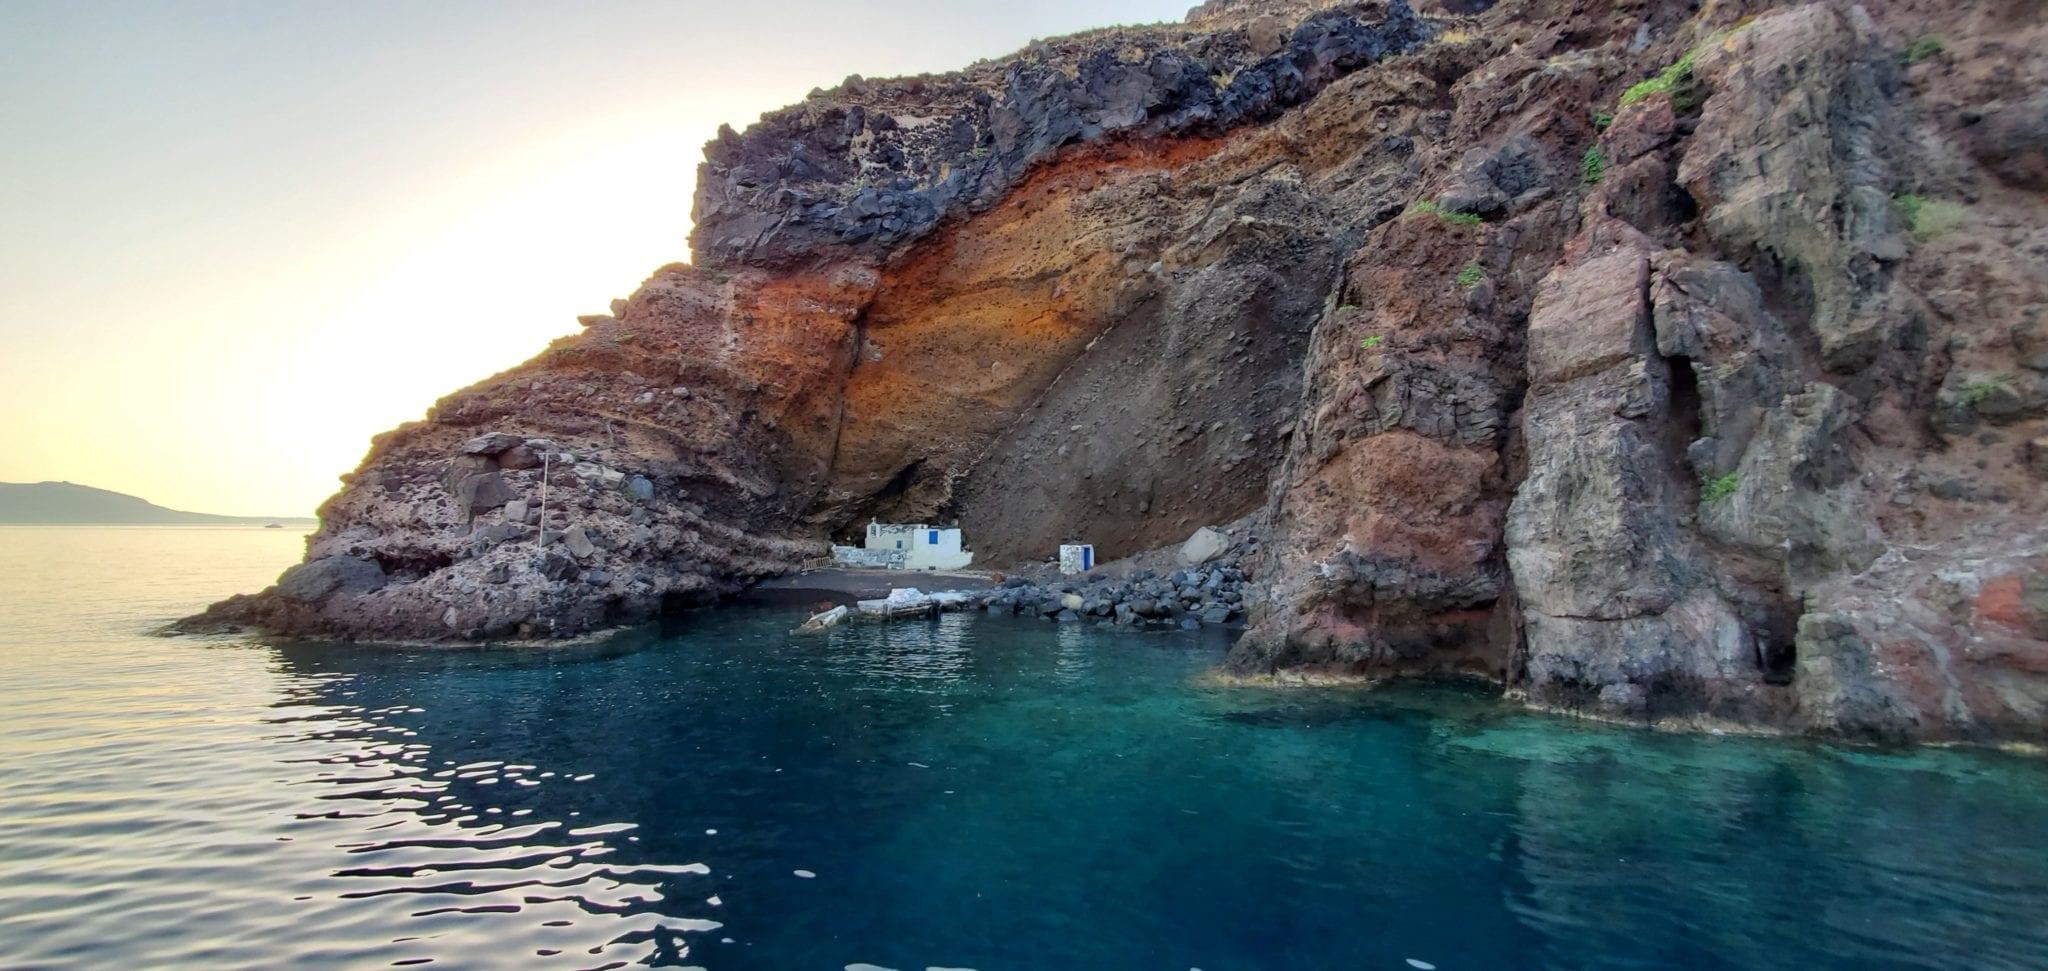 santorini pali kameni wellness travel guide -  Valef Yachts Chartering - 0754